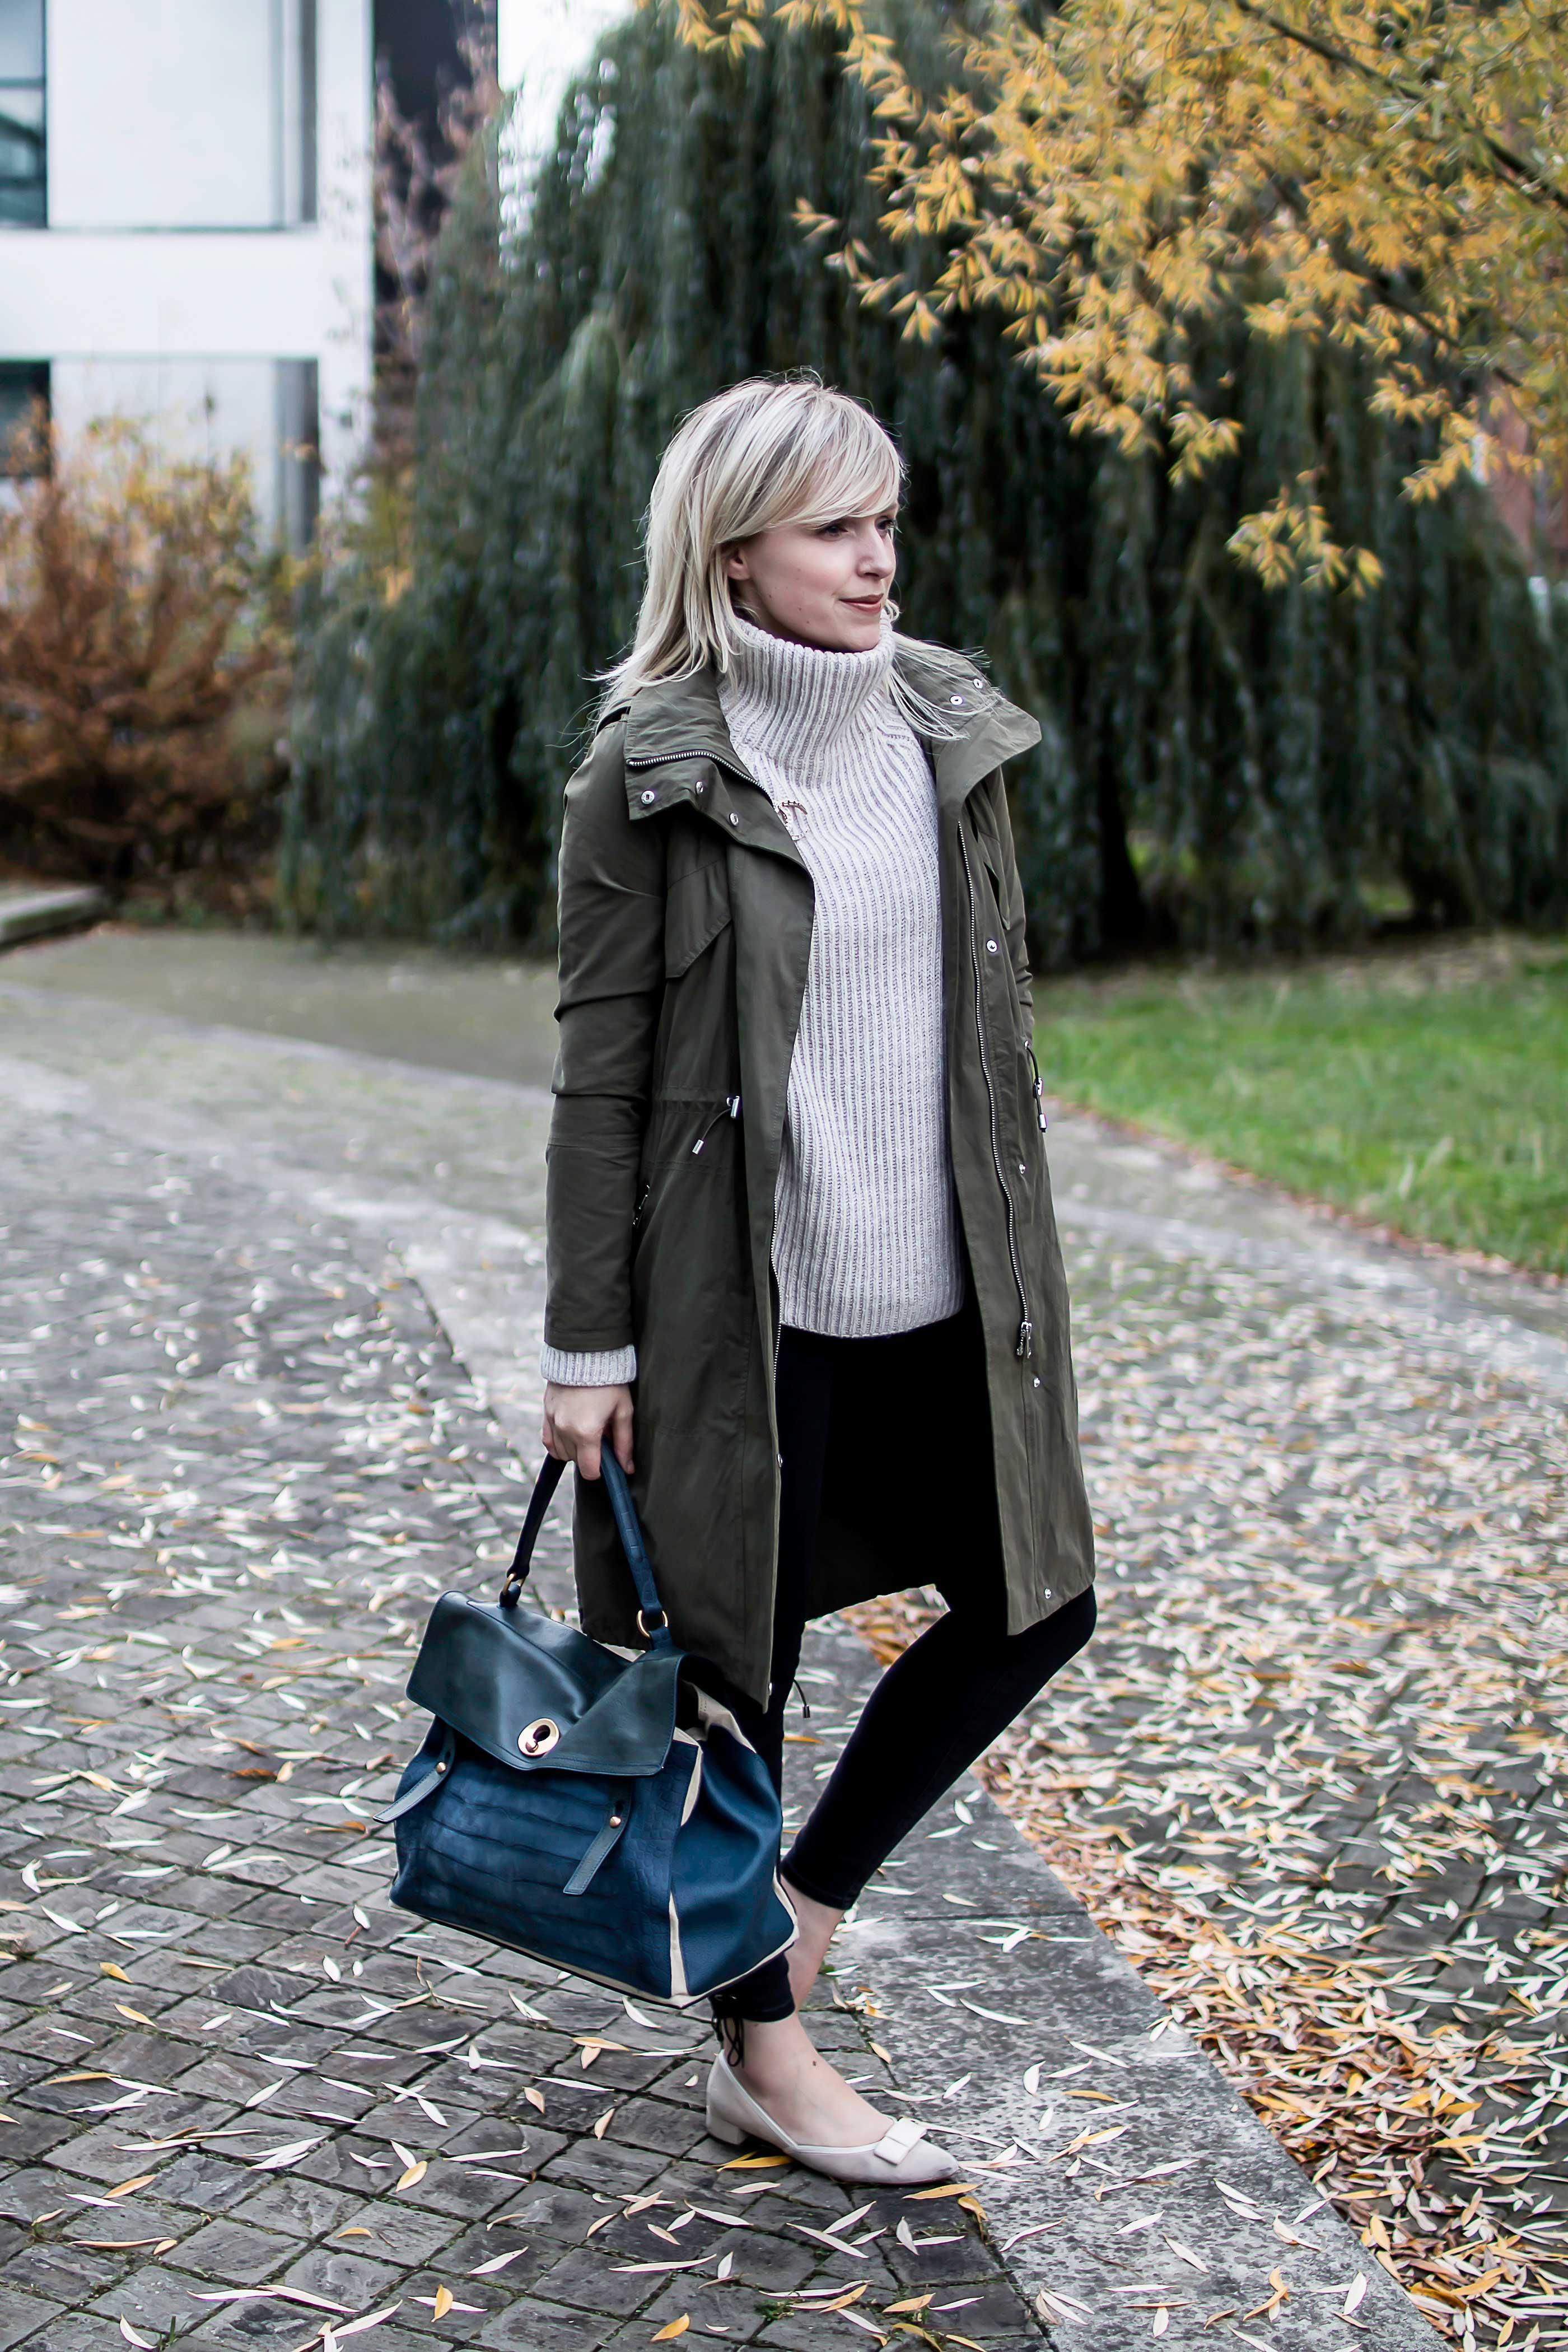 parka_navy_gruen_mango_ysl_vintage_herbst_outfit_2